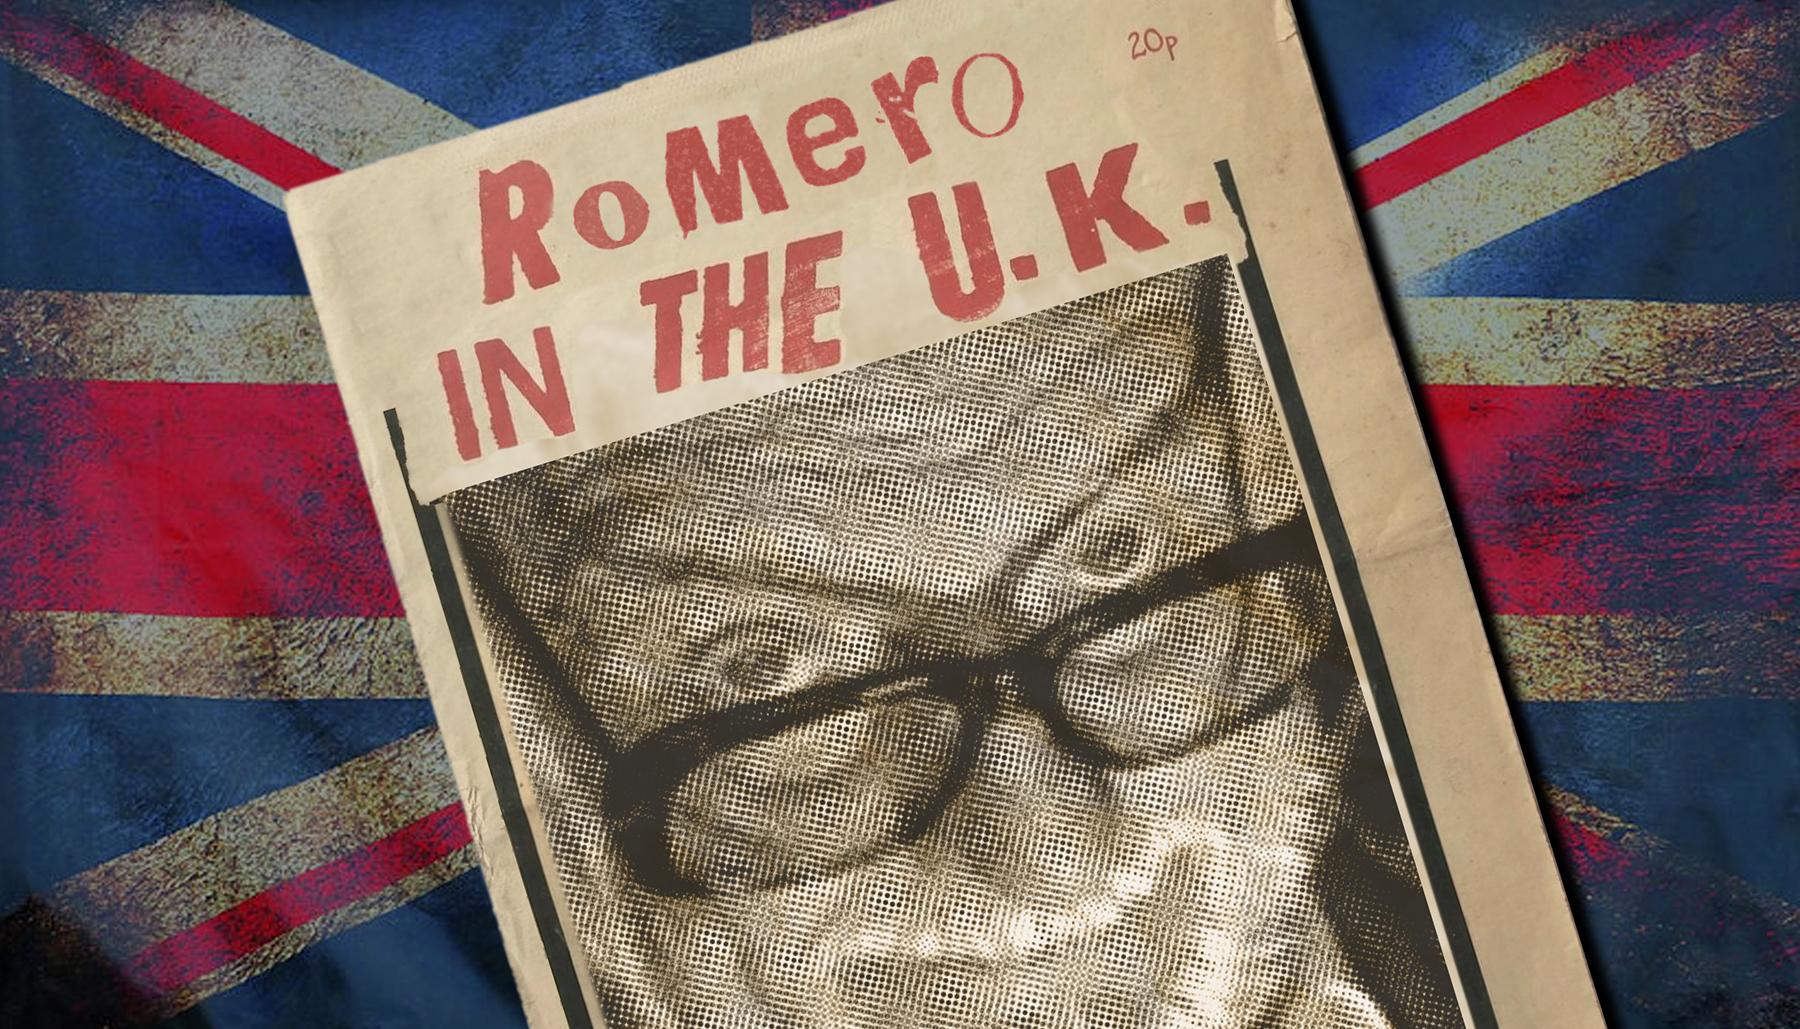 romero-in-the-uk-1